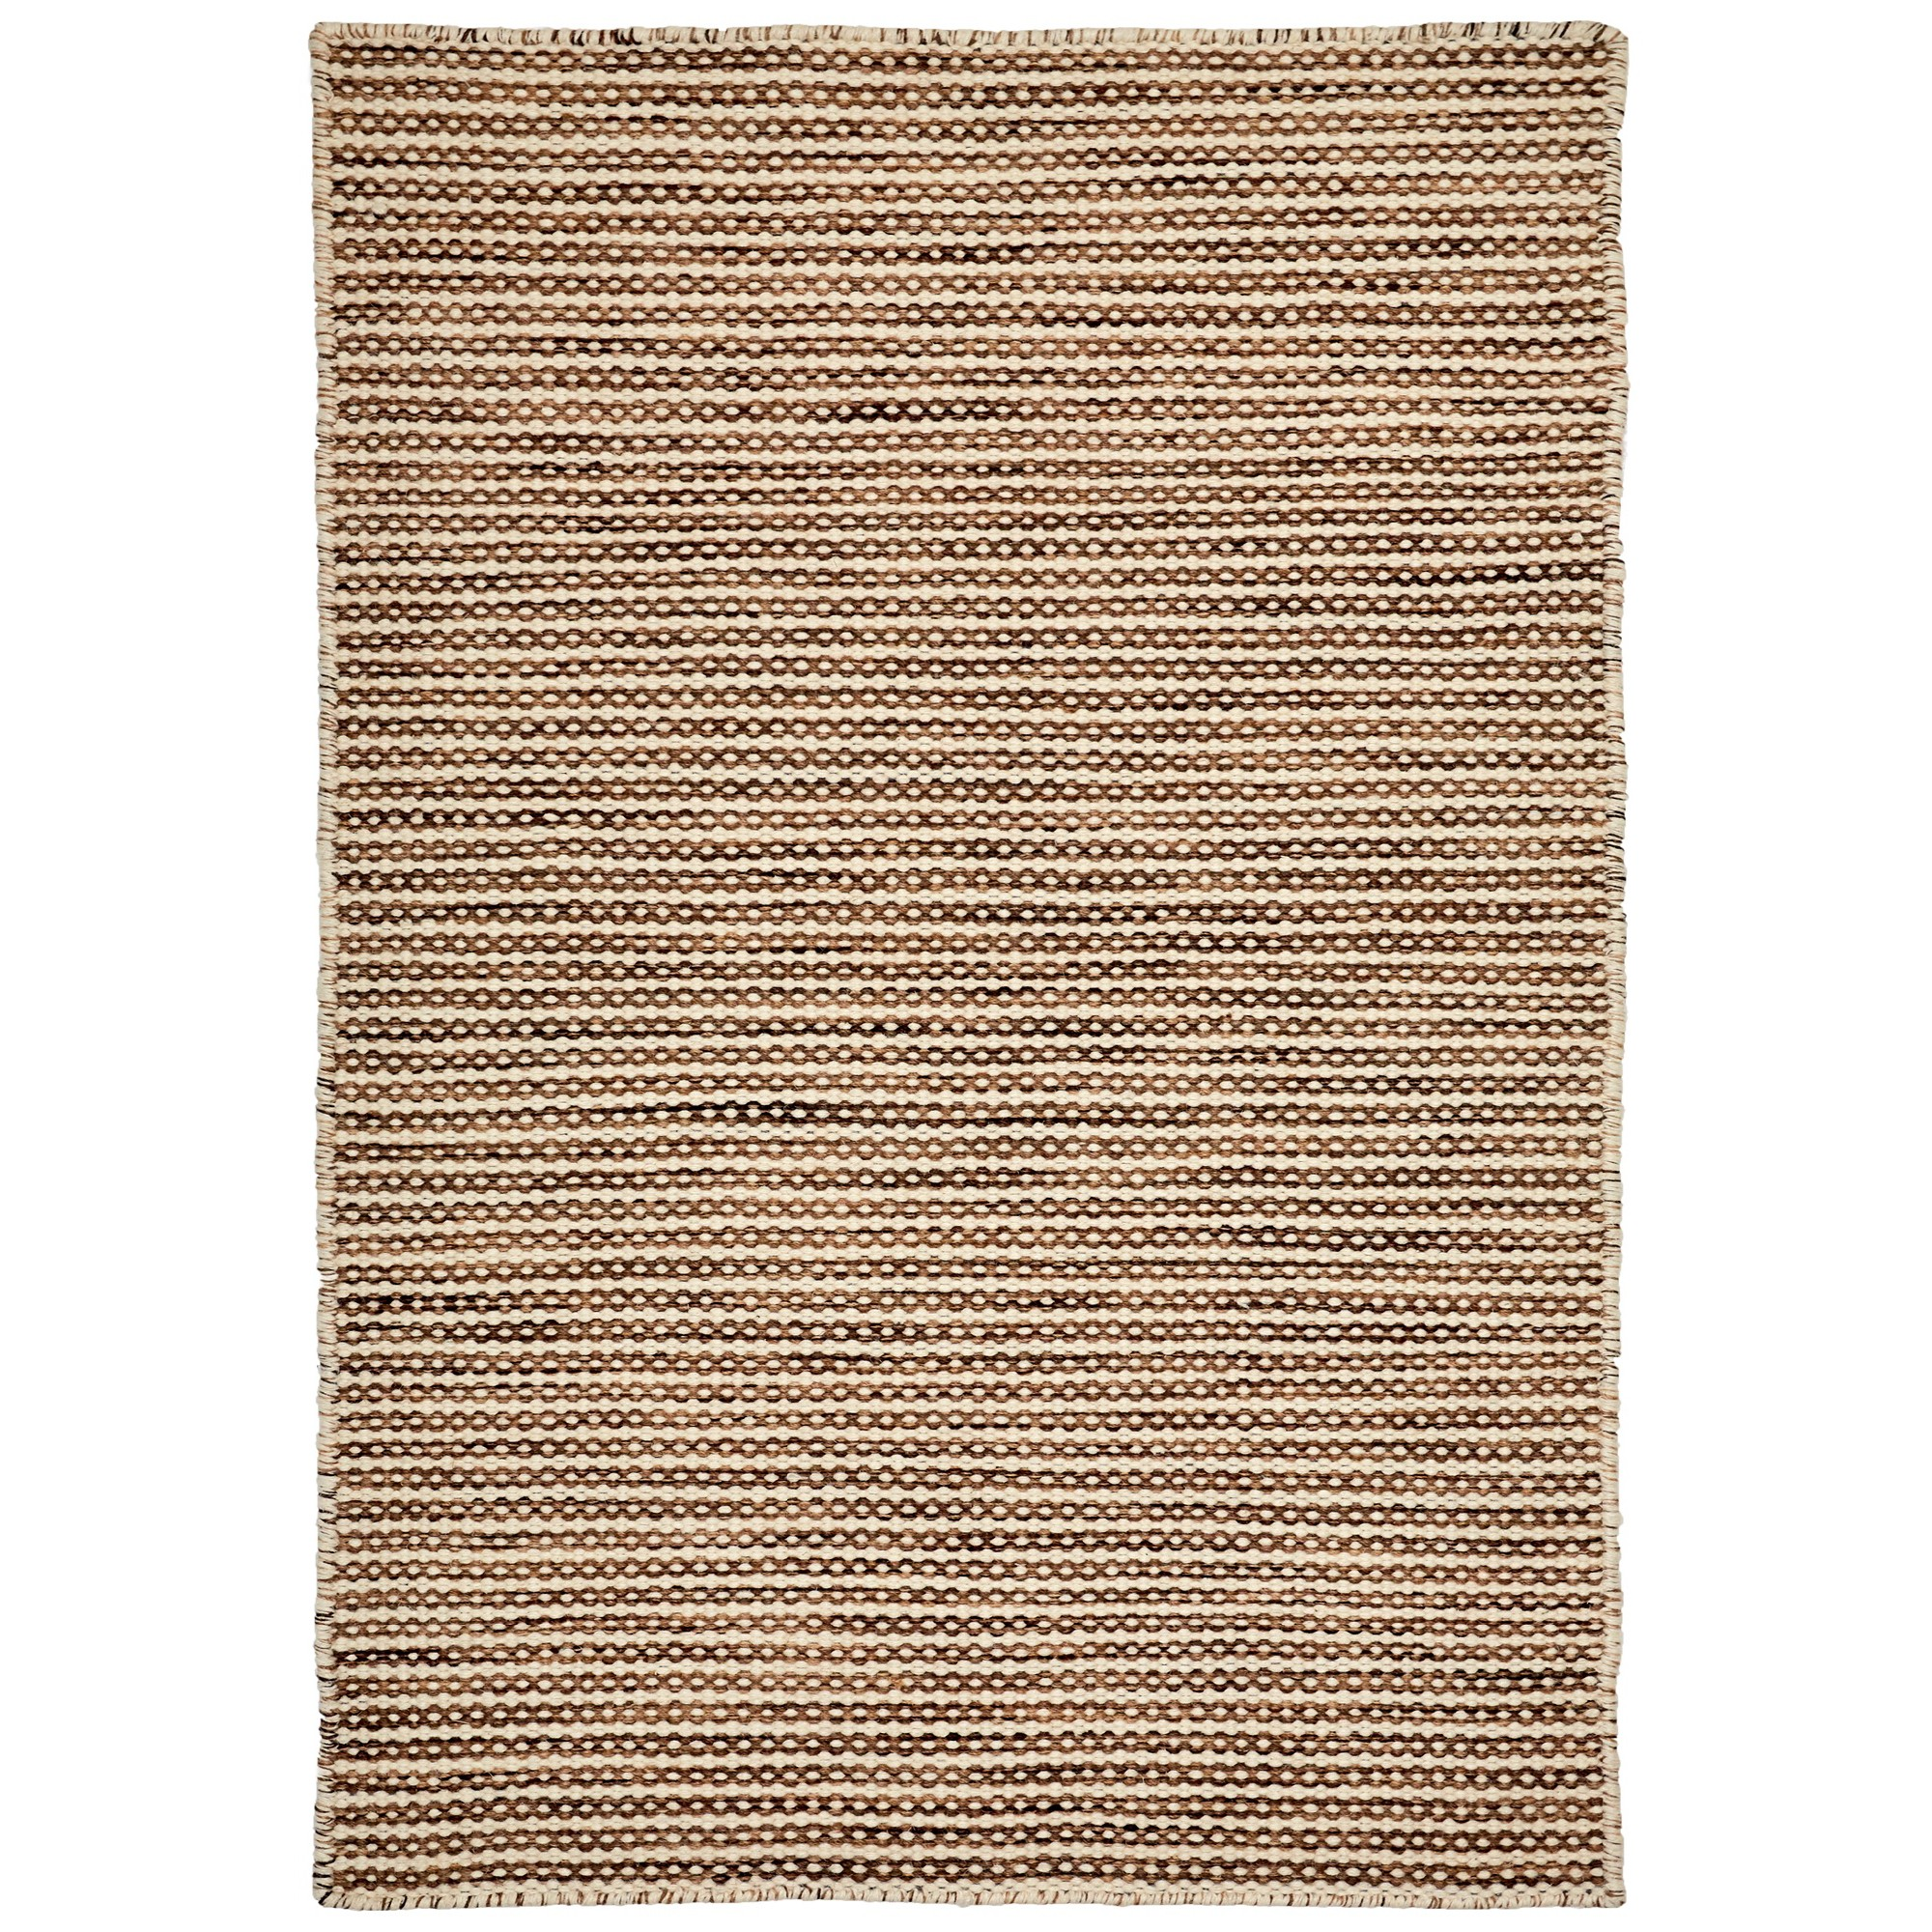 Chicago Handwoven Reversible Wool Rug, 330x240cm, Brown